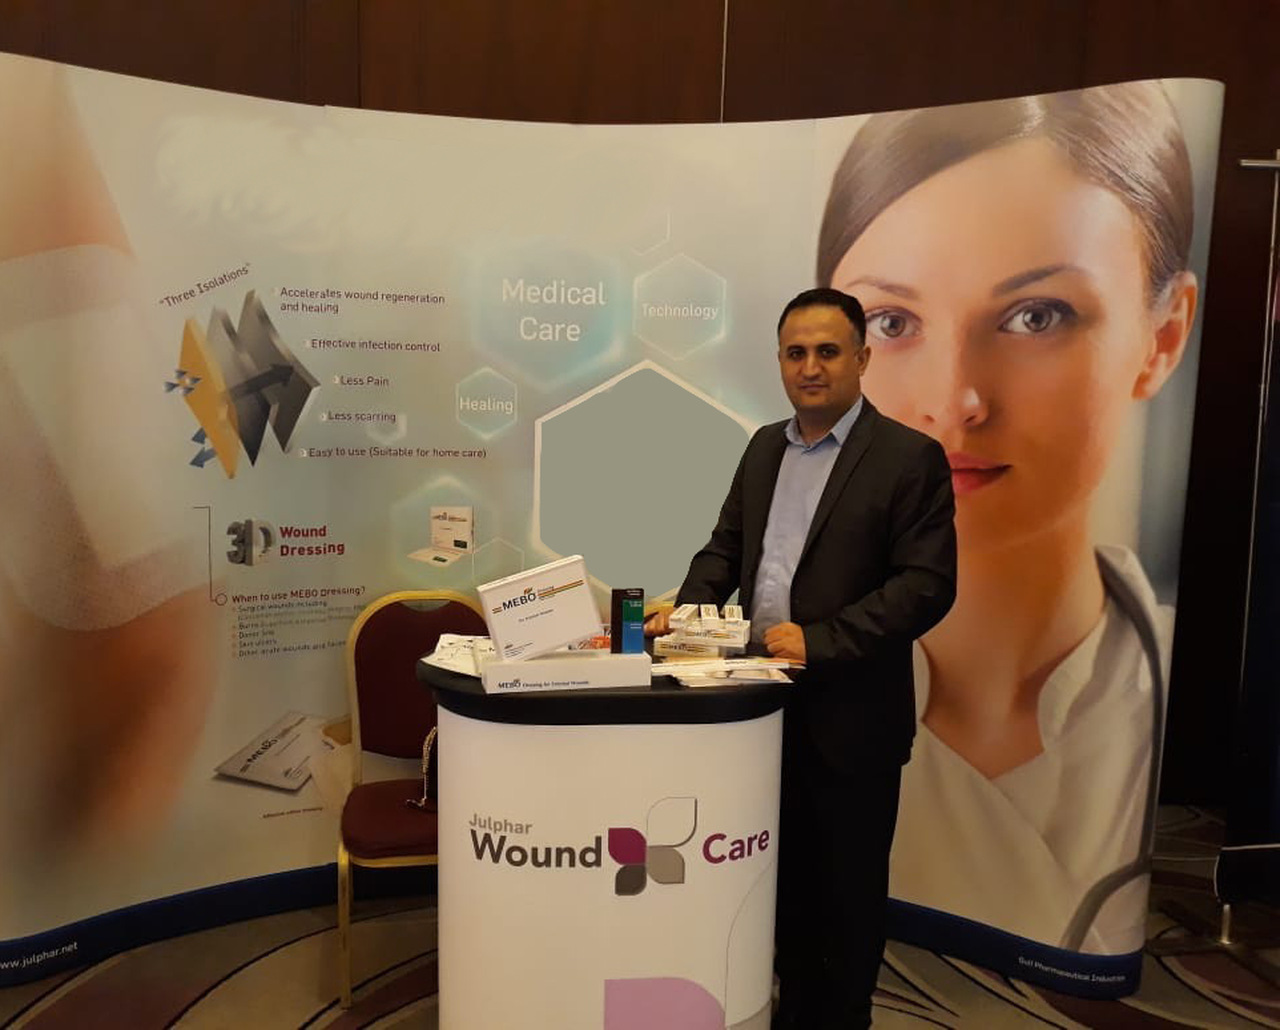 Julphar Participates in Leading Vascular Surgery Congress